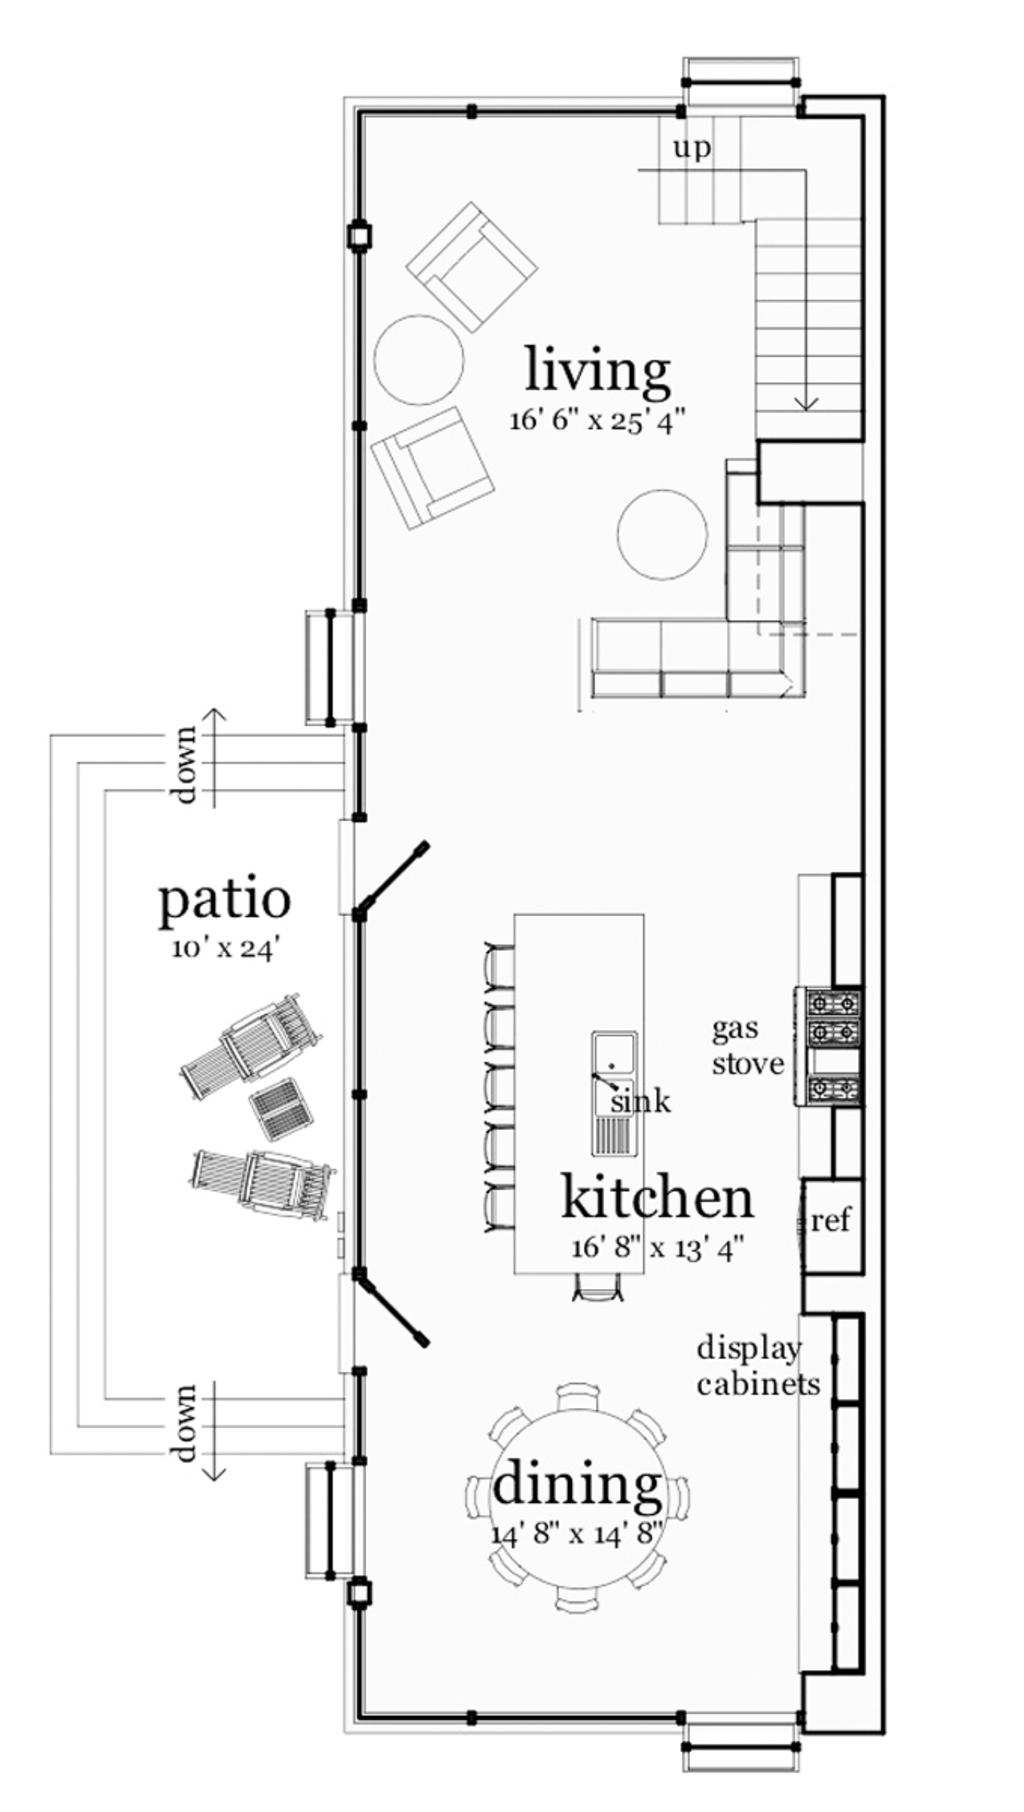 Modern Style House Plan 2 Beds 1 5 Baths 1203 Sq Ft Plan 909 3 Modern Loft House Floor Plans Modern Style House Plans